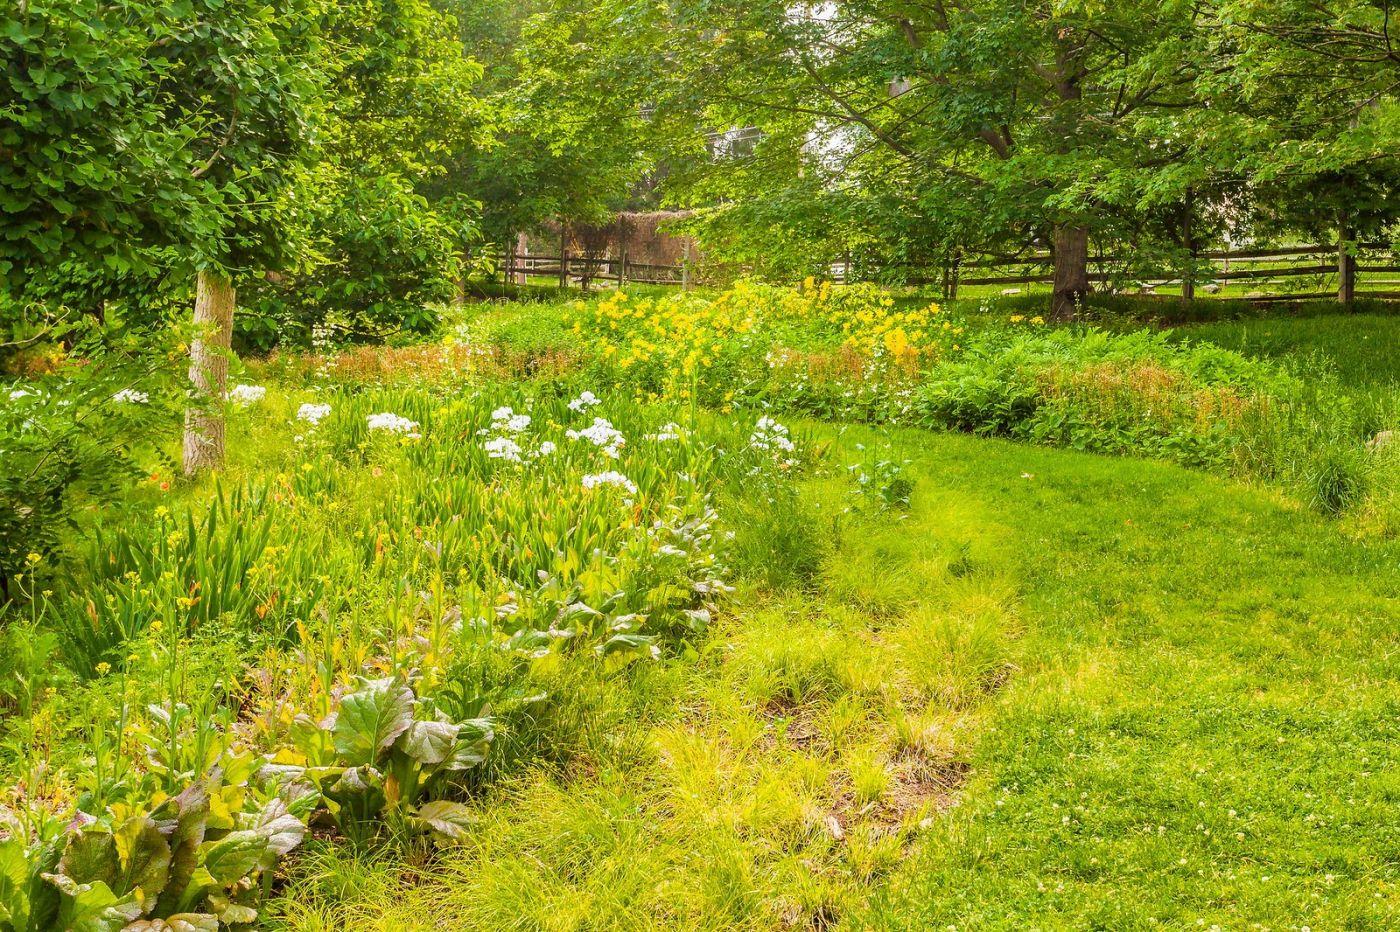 Chanticleer花园,融入自然_图1-13